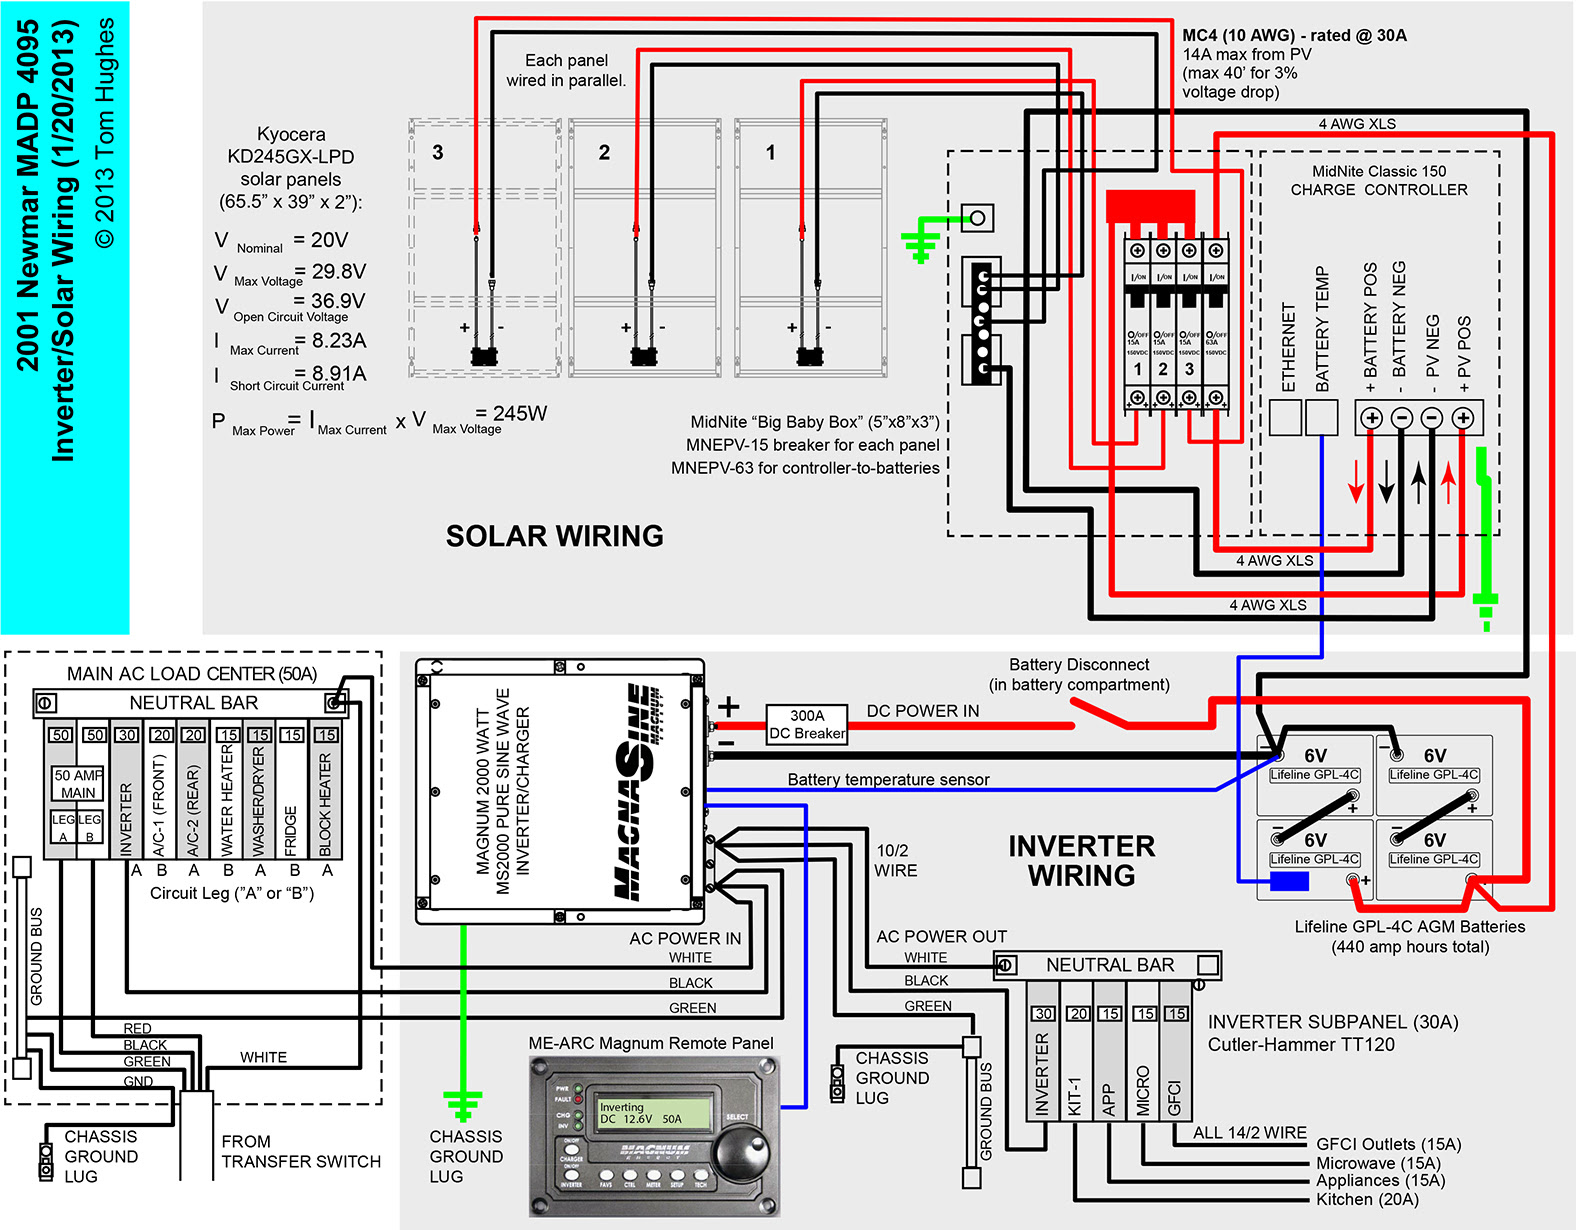 Free Diagram 2000w Inverter Wiring Diagram Full Version Hd Quality Wiring Diagram Riyuewire Bandb Veneto It